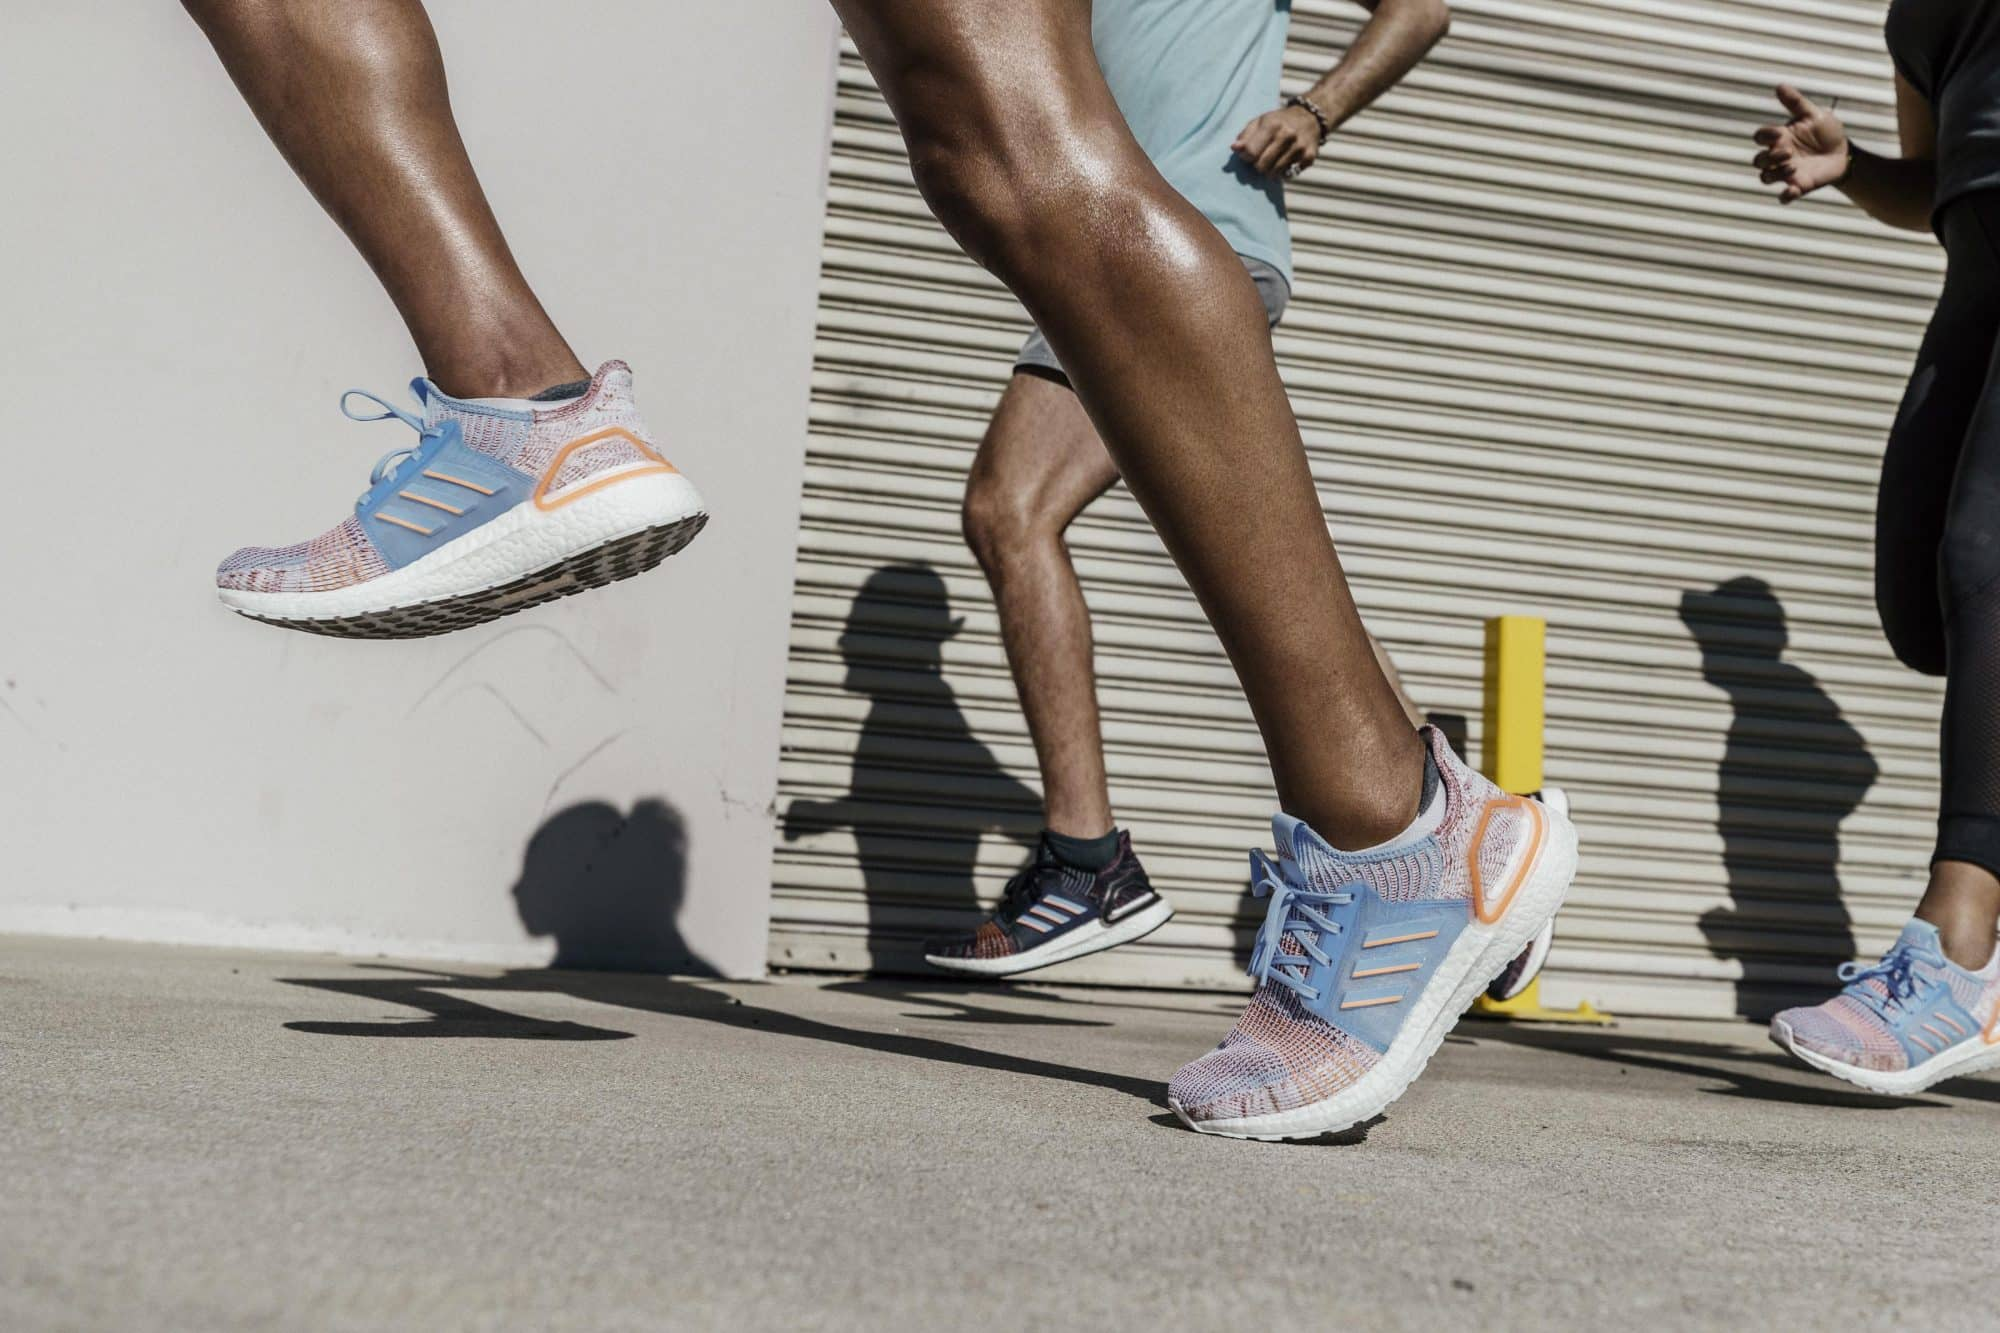 Adidas Ultra Boost : toute son actualité | Sneakers actus